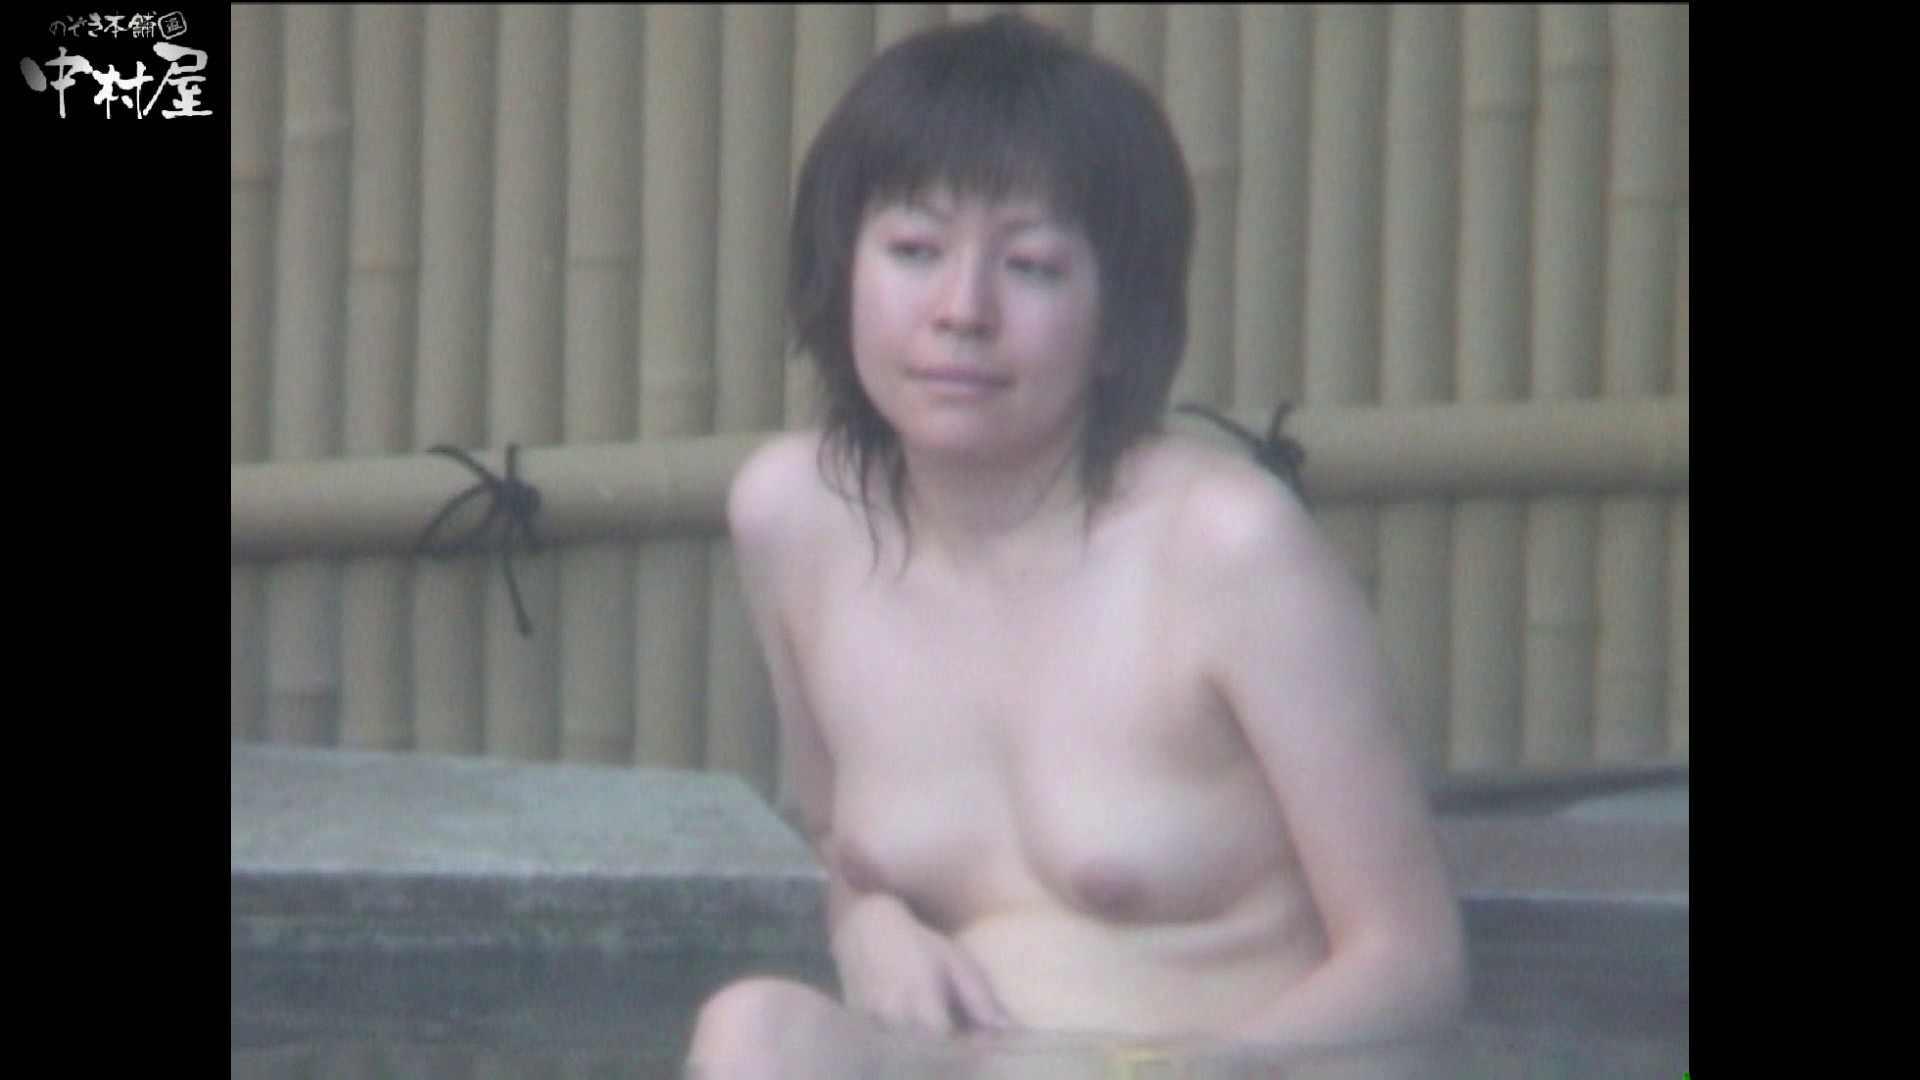 Aquaな露天風呂Vol.985 OLセックス  50画像 6